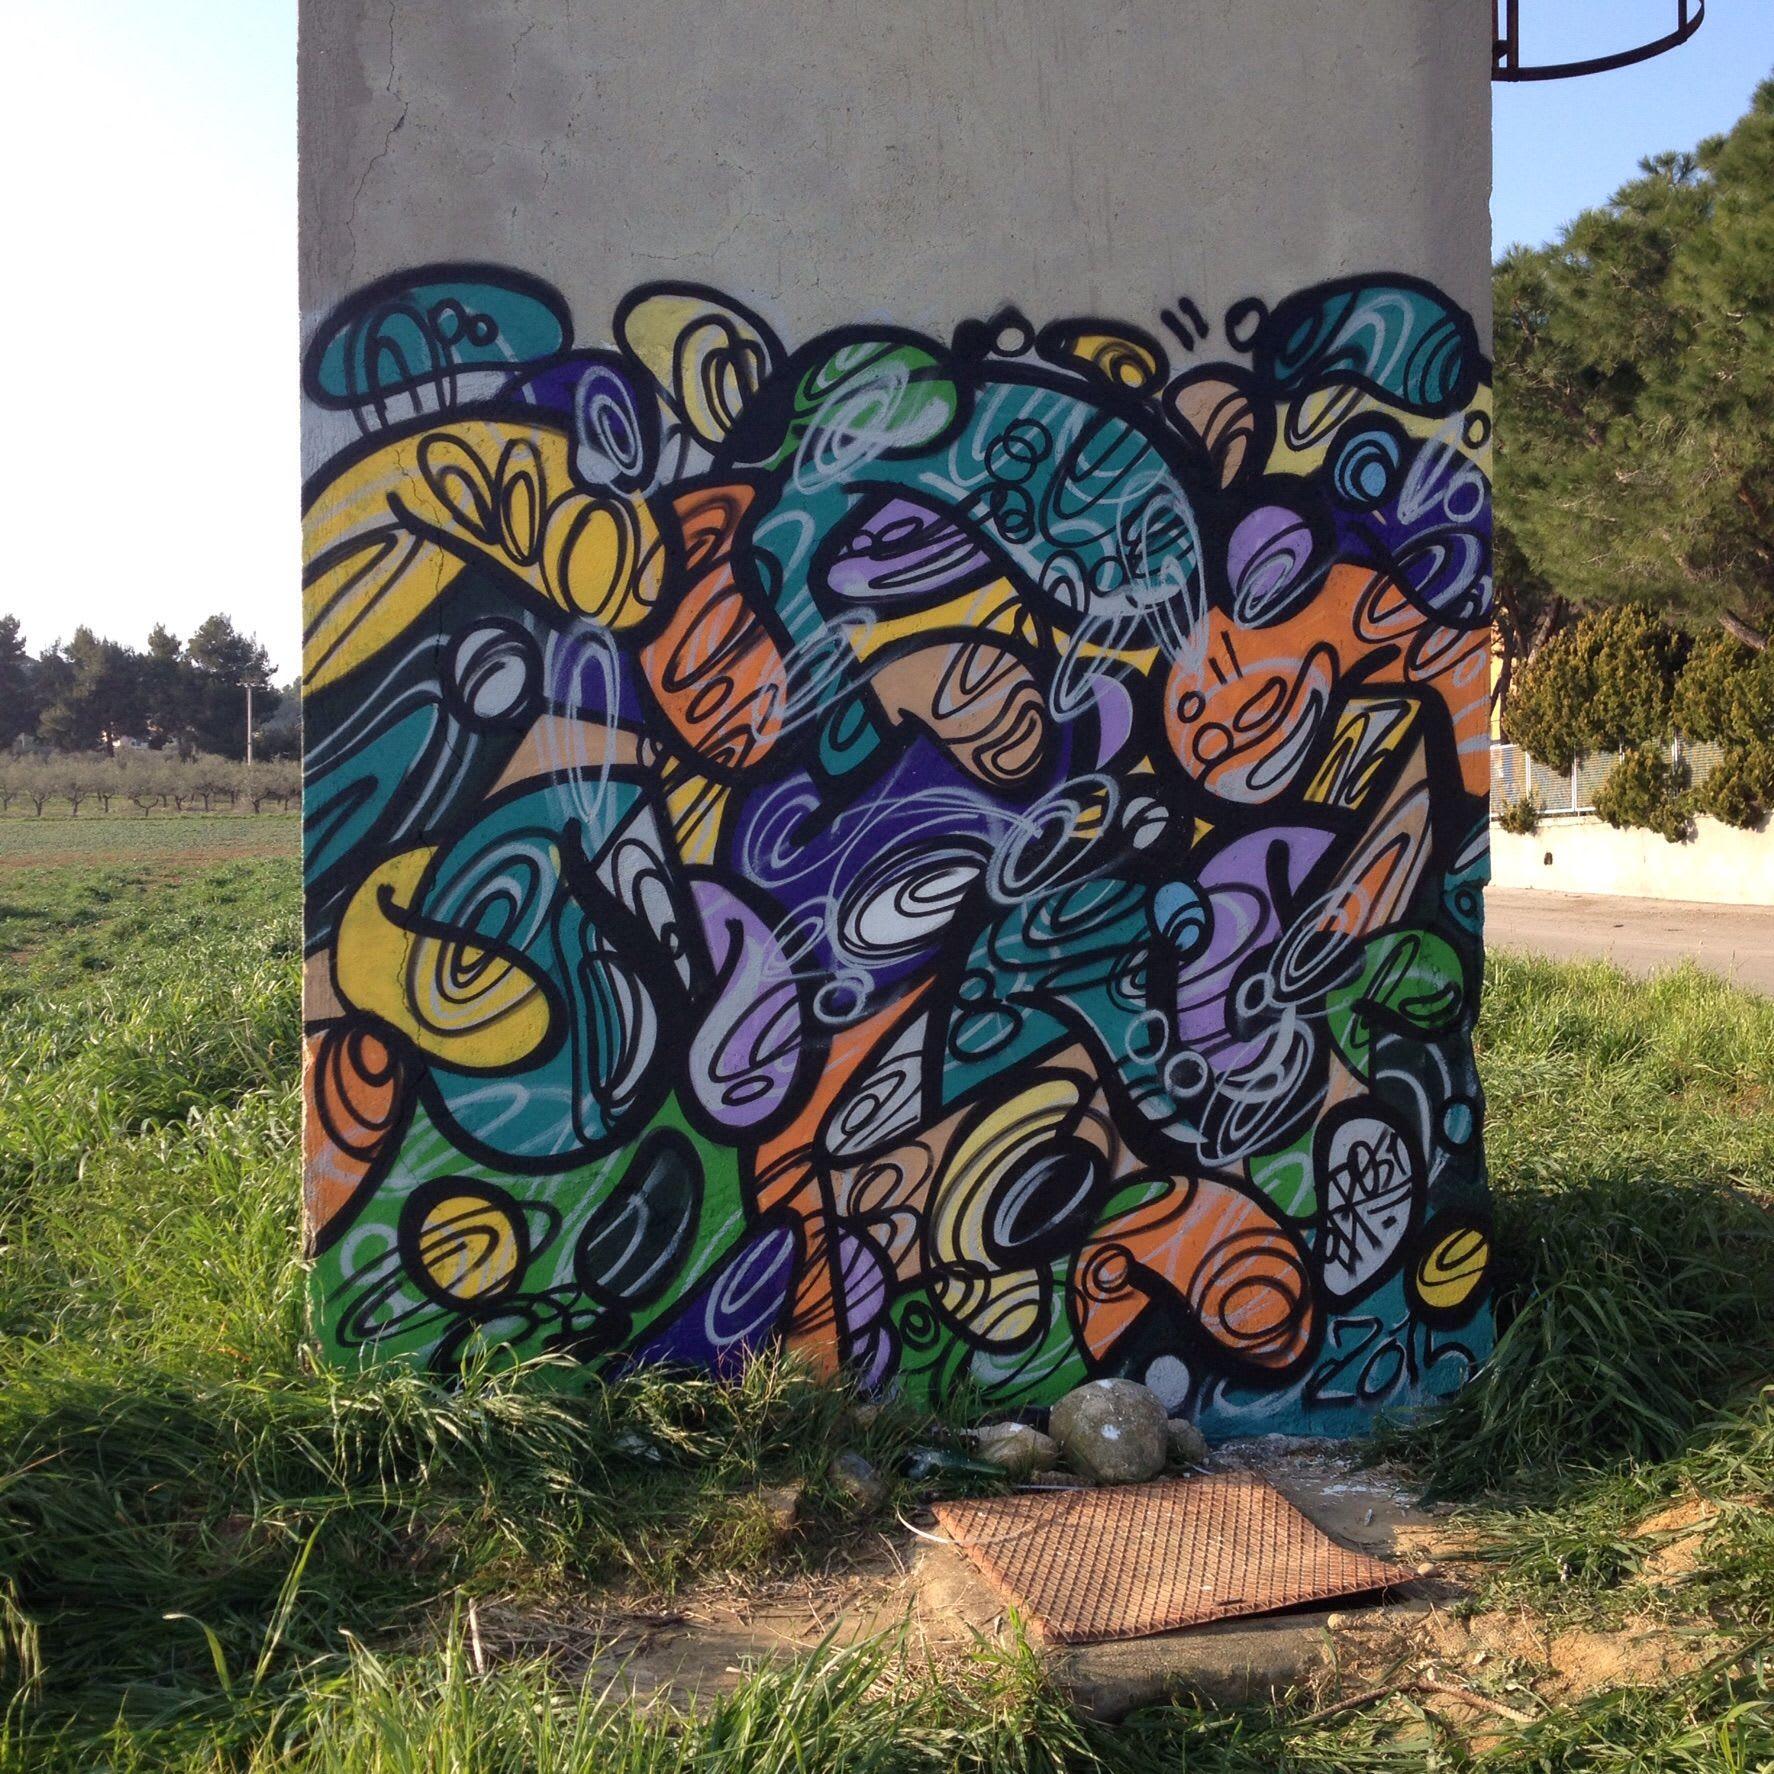 Œuvre Par IDRO51 à Pescara